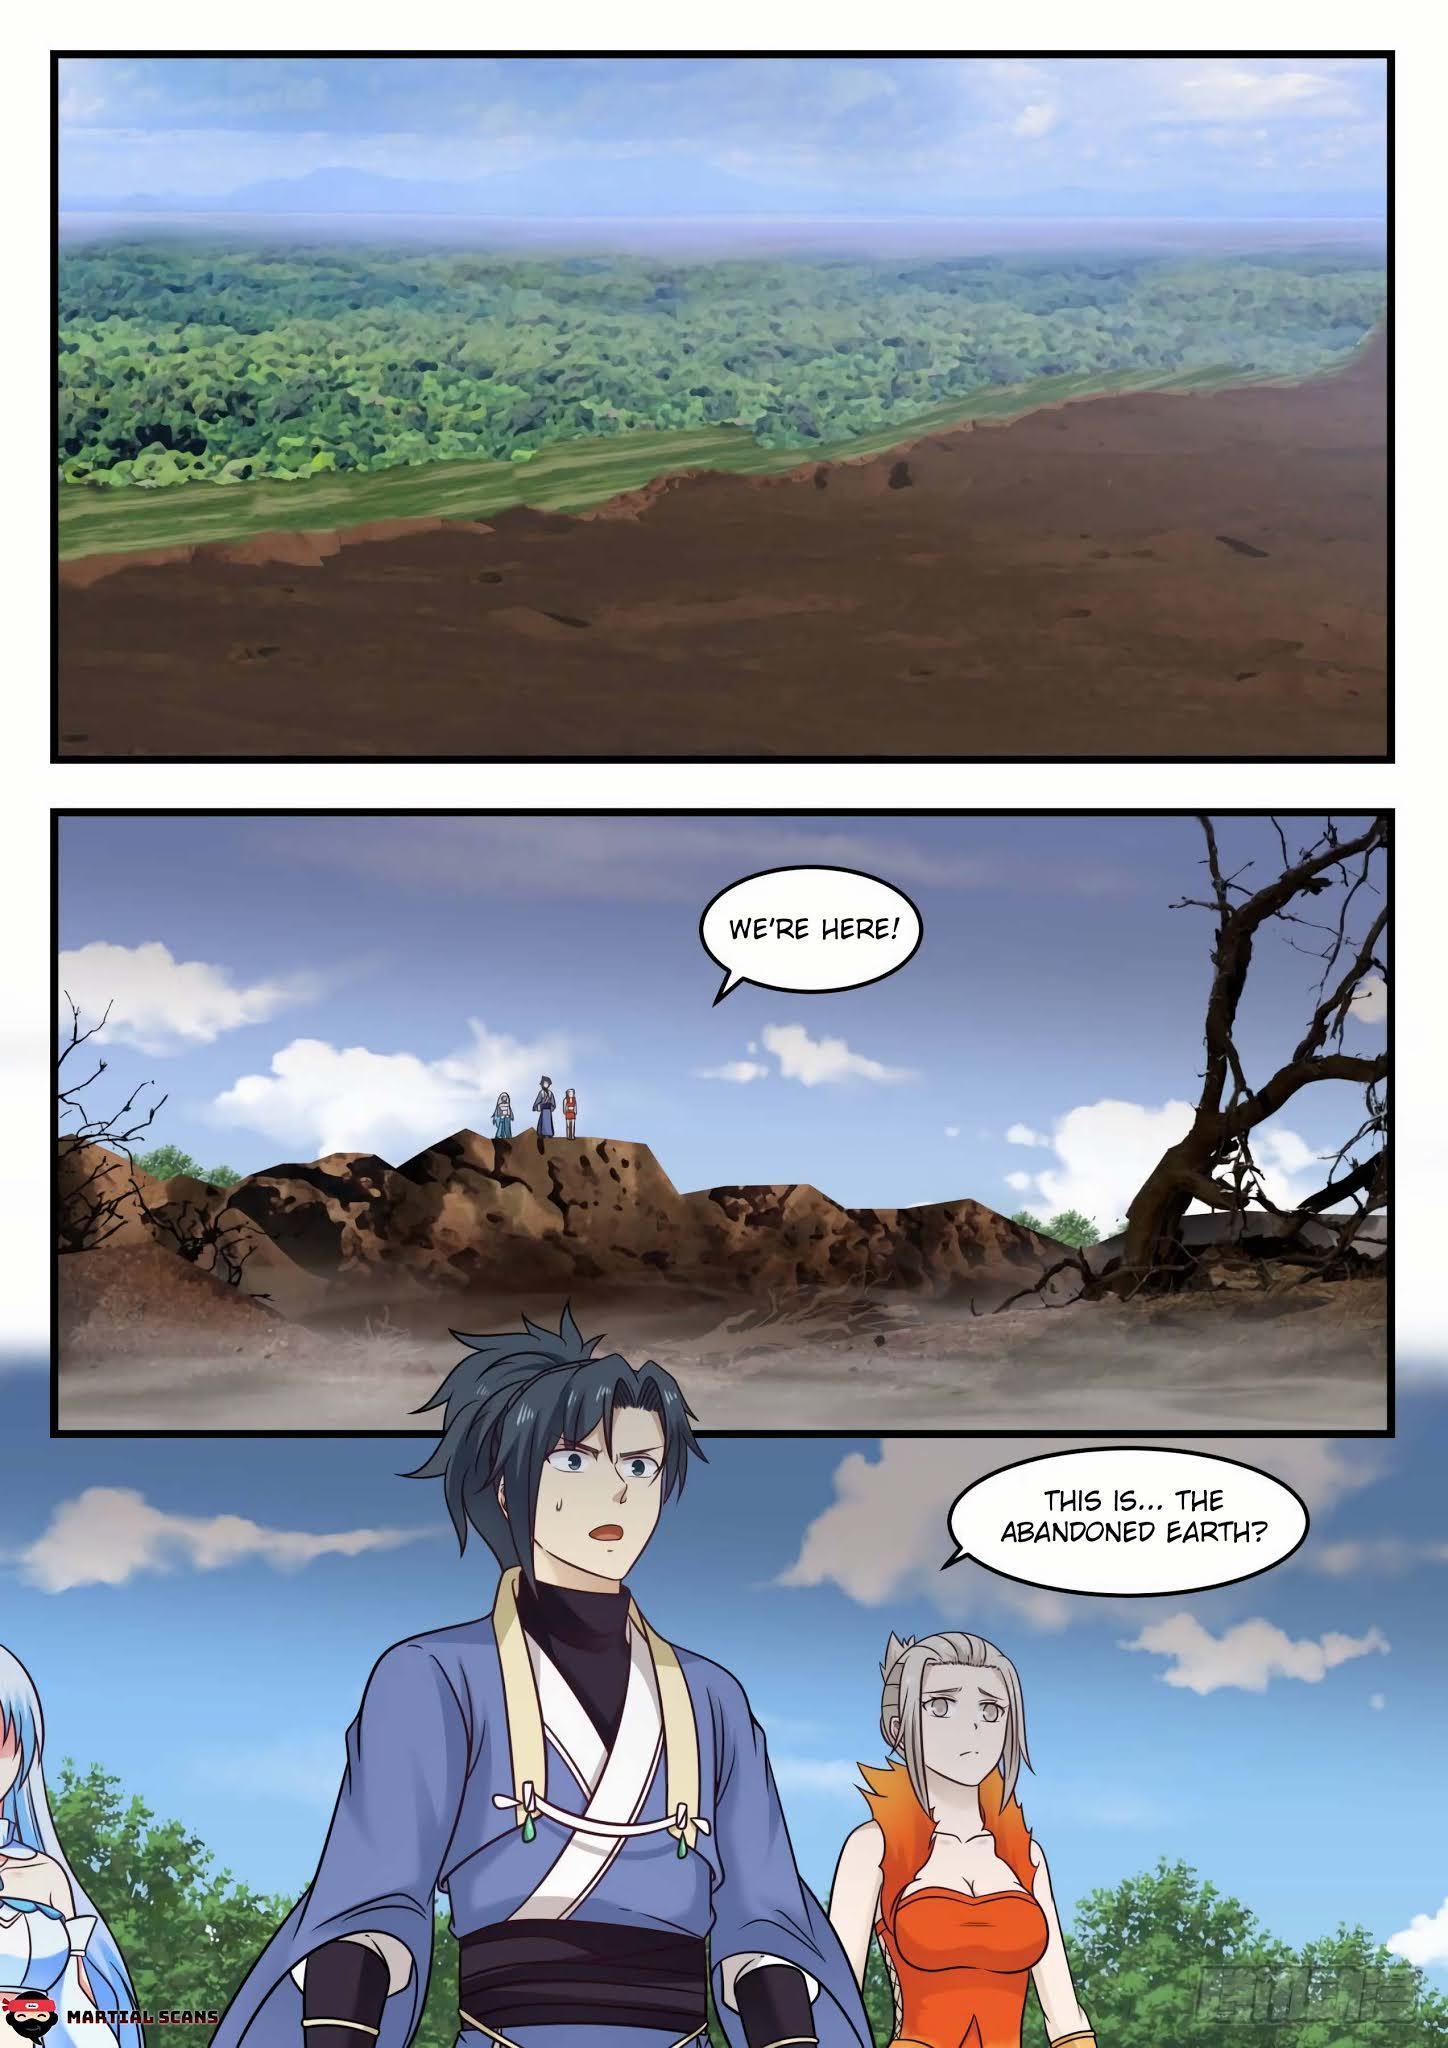 Martial Peak Chapter 583 - Abandoned Earth page 10 - Mangakakalots.com